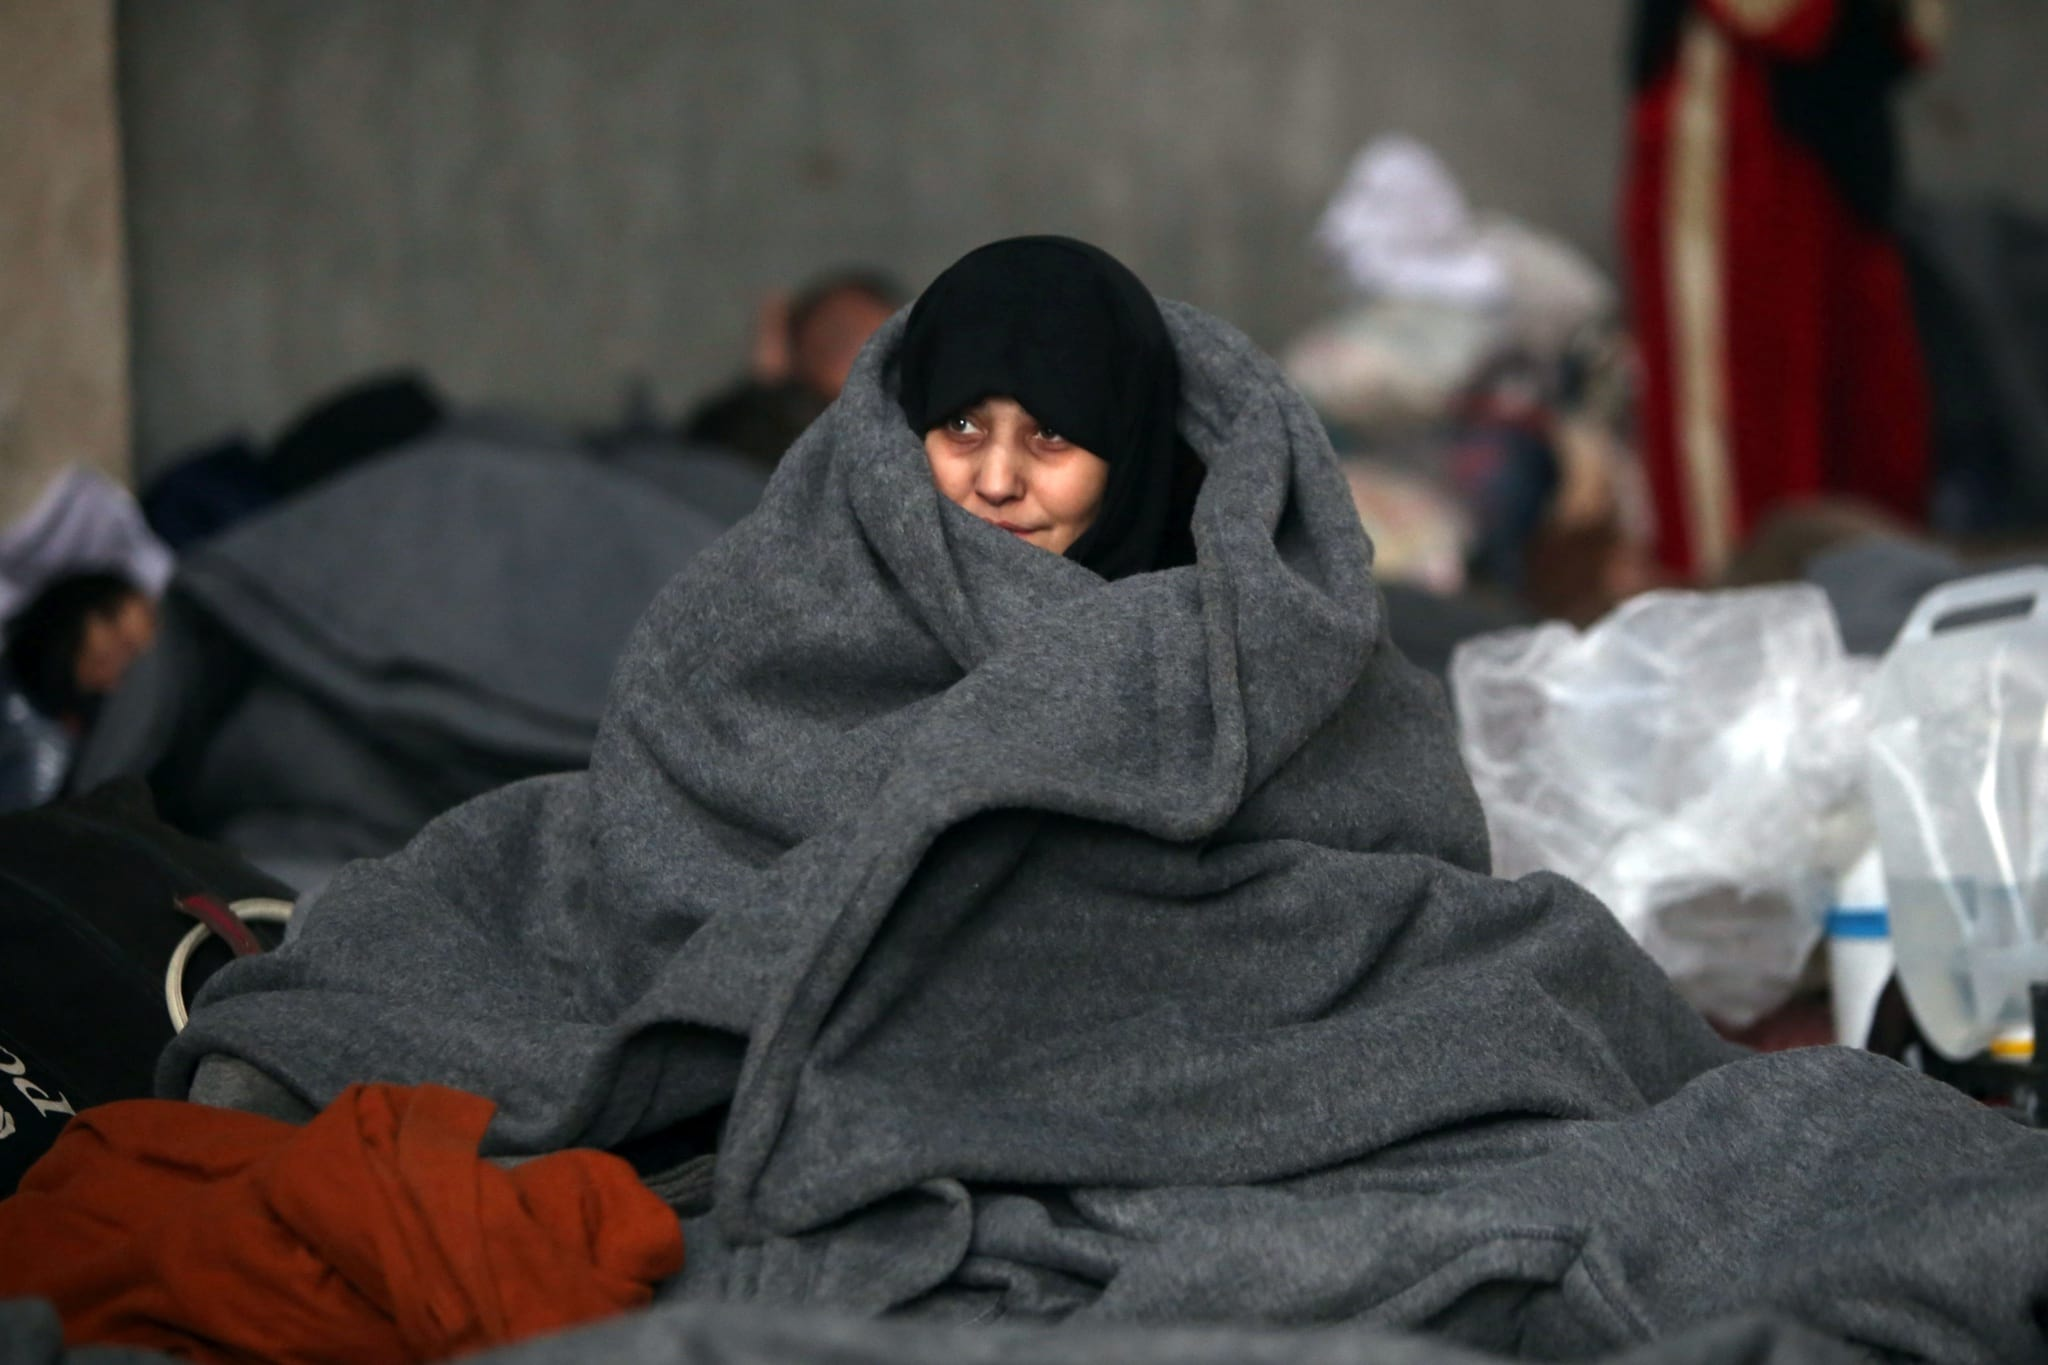 PÚBLICO - Rebeldes perdem cerca de 60% de Alepo